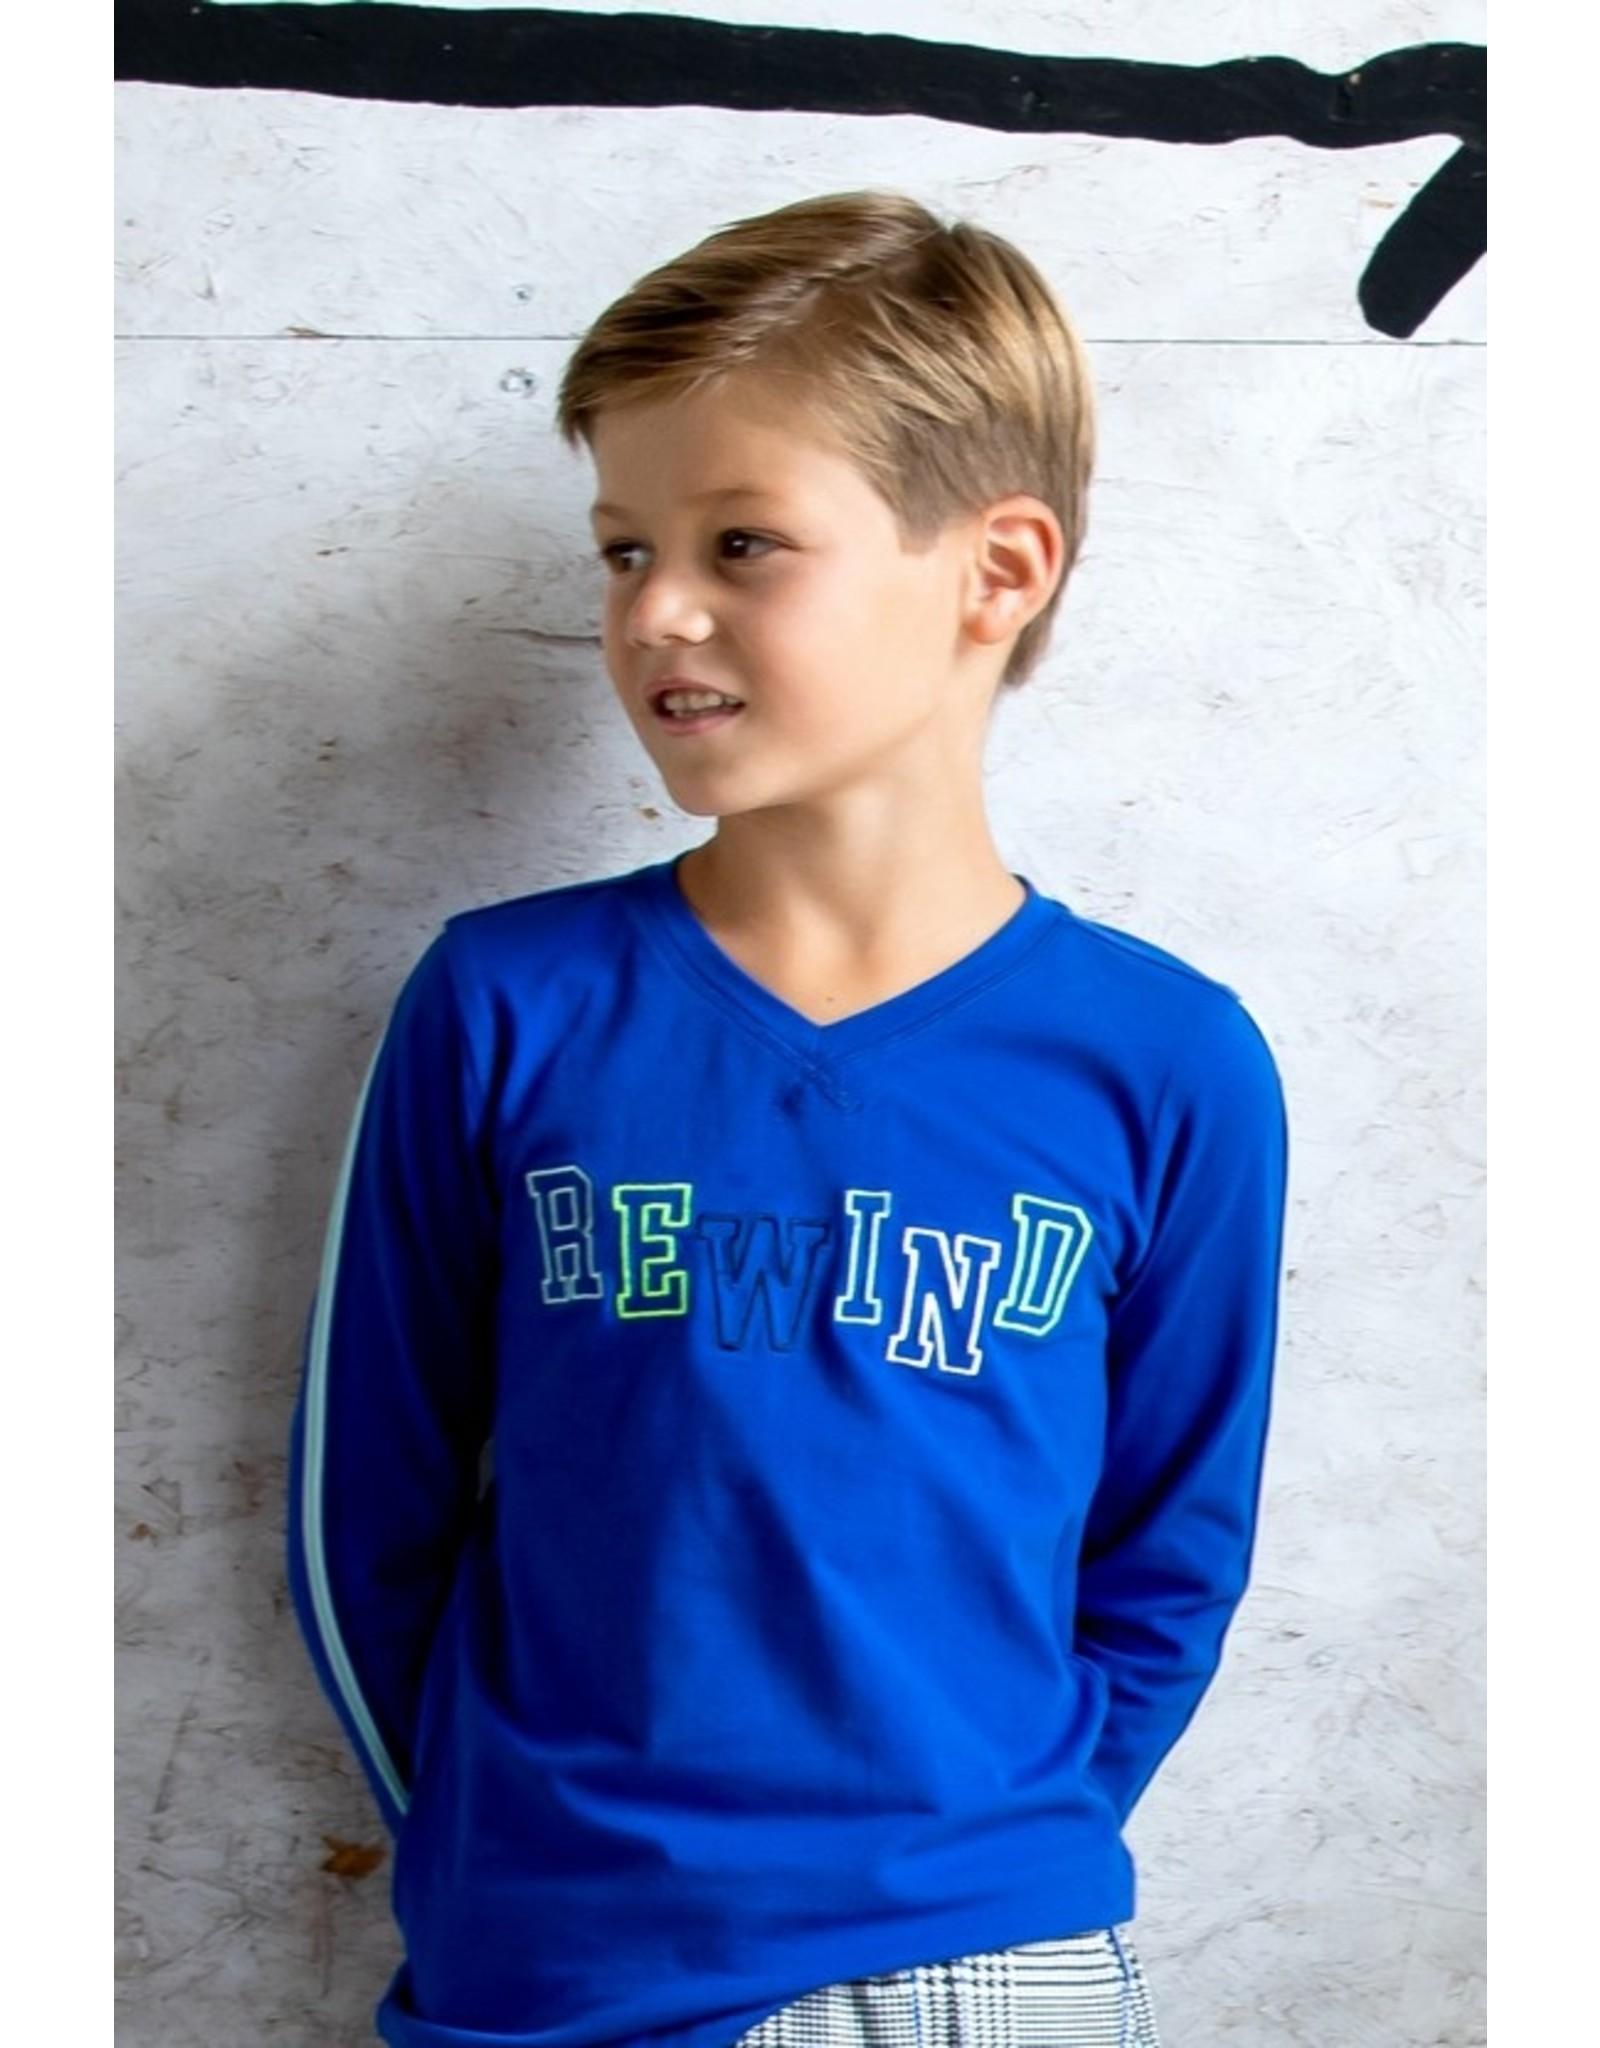 B-Nosy Boys long sleeve with v-neck, tape on sleeves, Cobalt blue